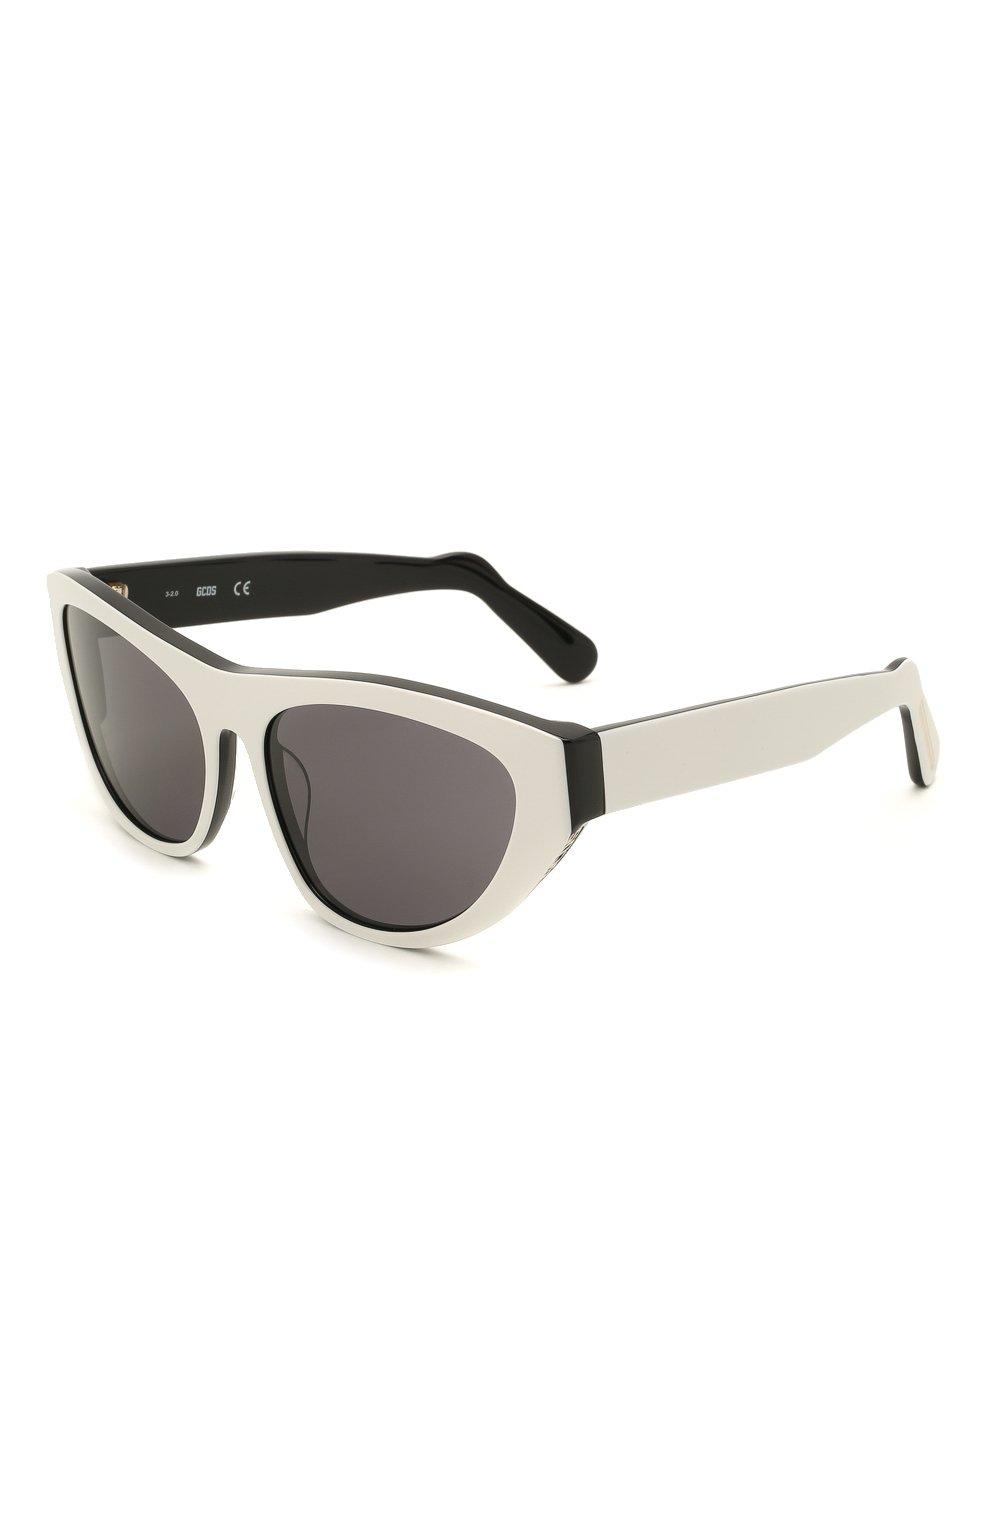 Женские солнцезащитные очки GCDS черно-белого цвета, арт. GD0010 21A | Фото 1 (Тип очков: С/з; Очки форма: Cat-eye; Оптика Гендер: оптика-унисекс)